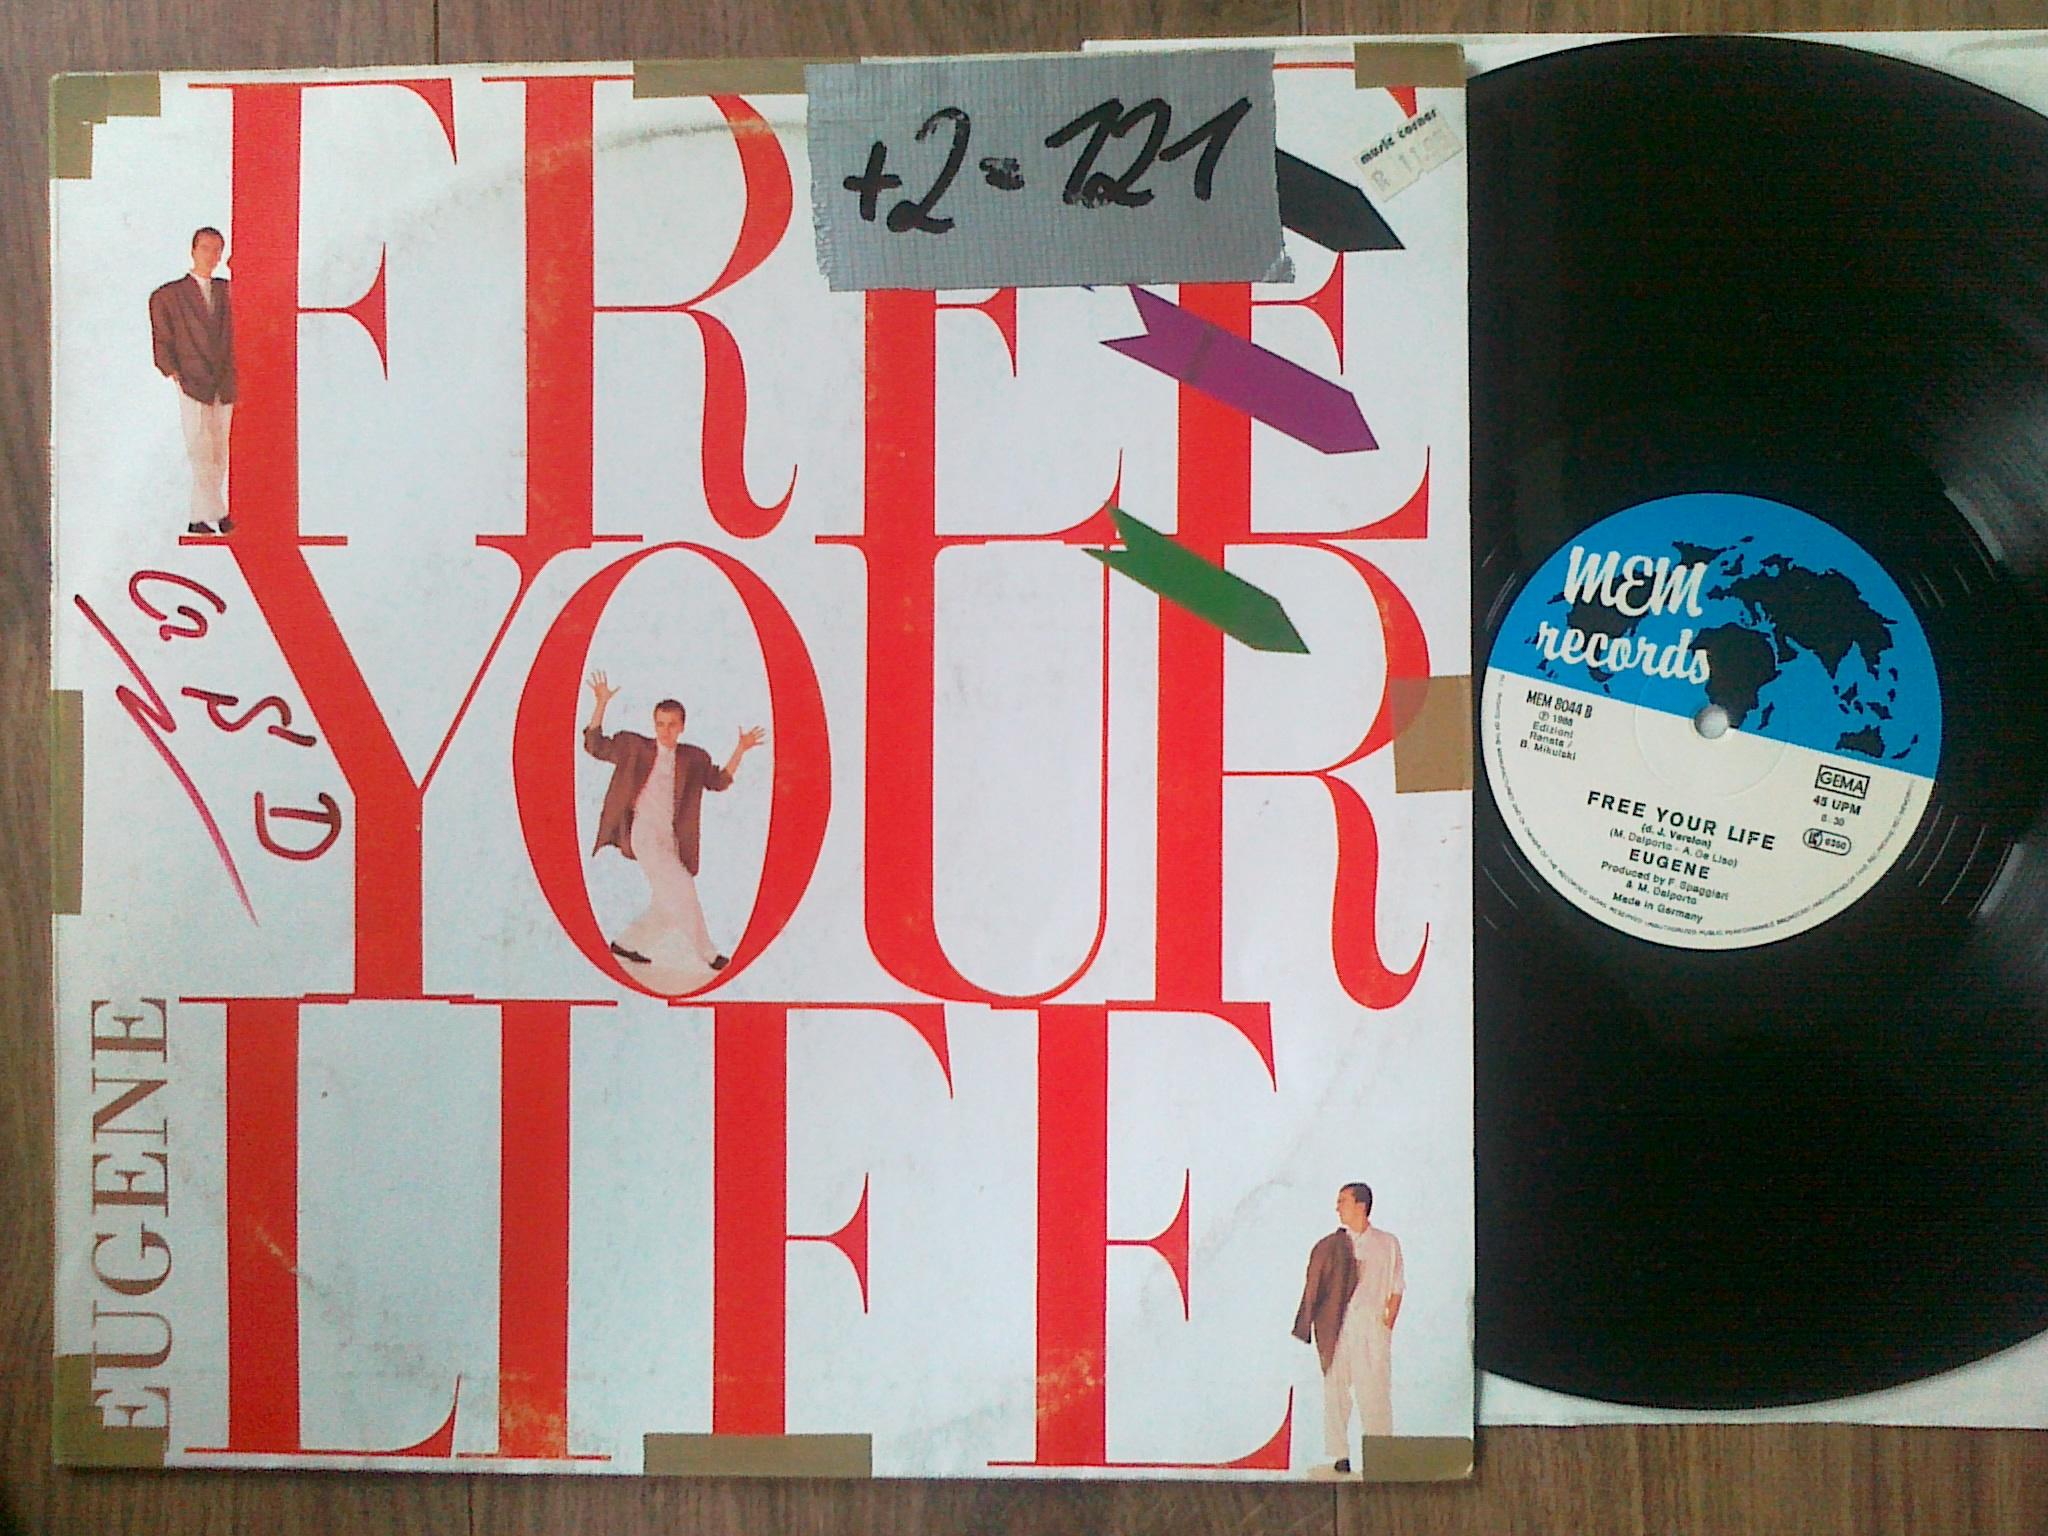 Eugene - Free Your Life